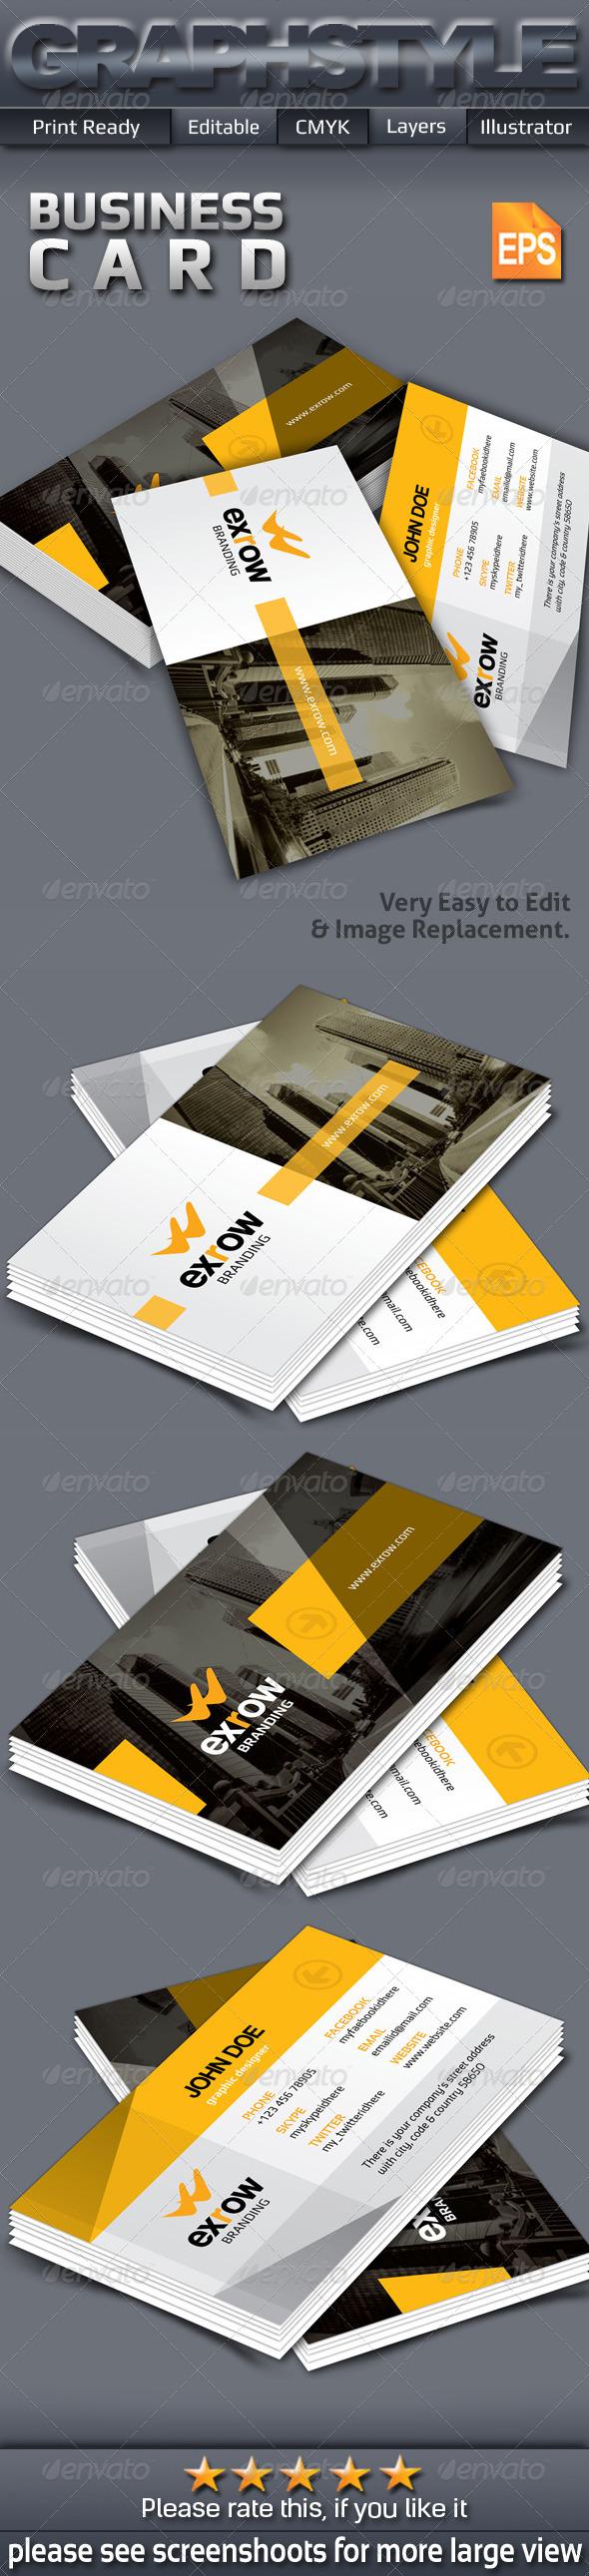 GraphicRiver Exrow Creative Business Card 7371728